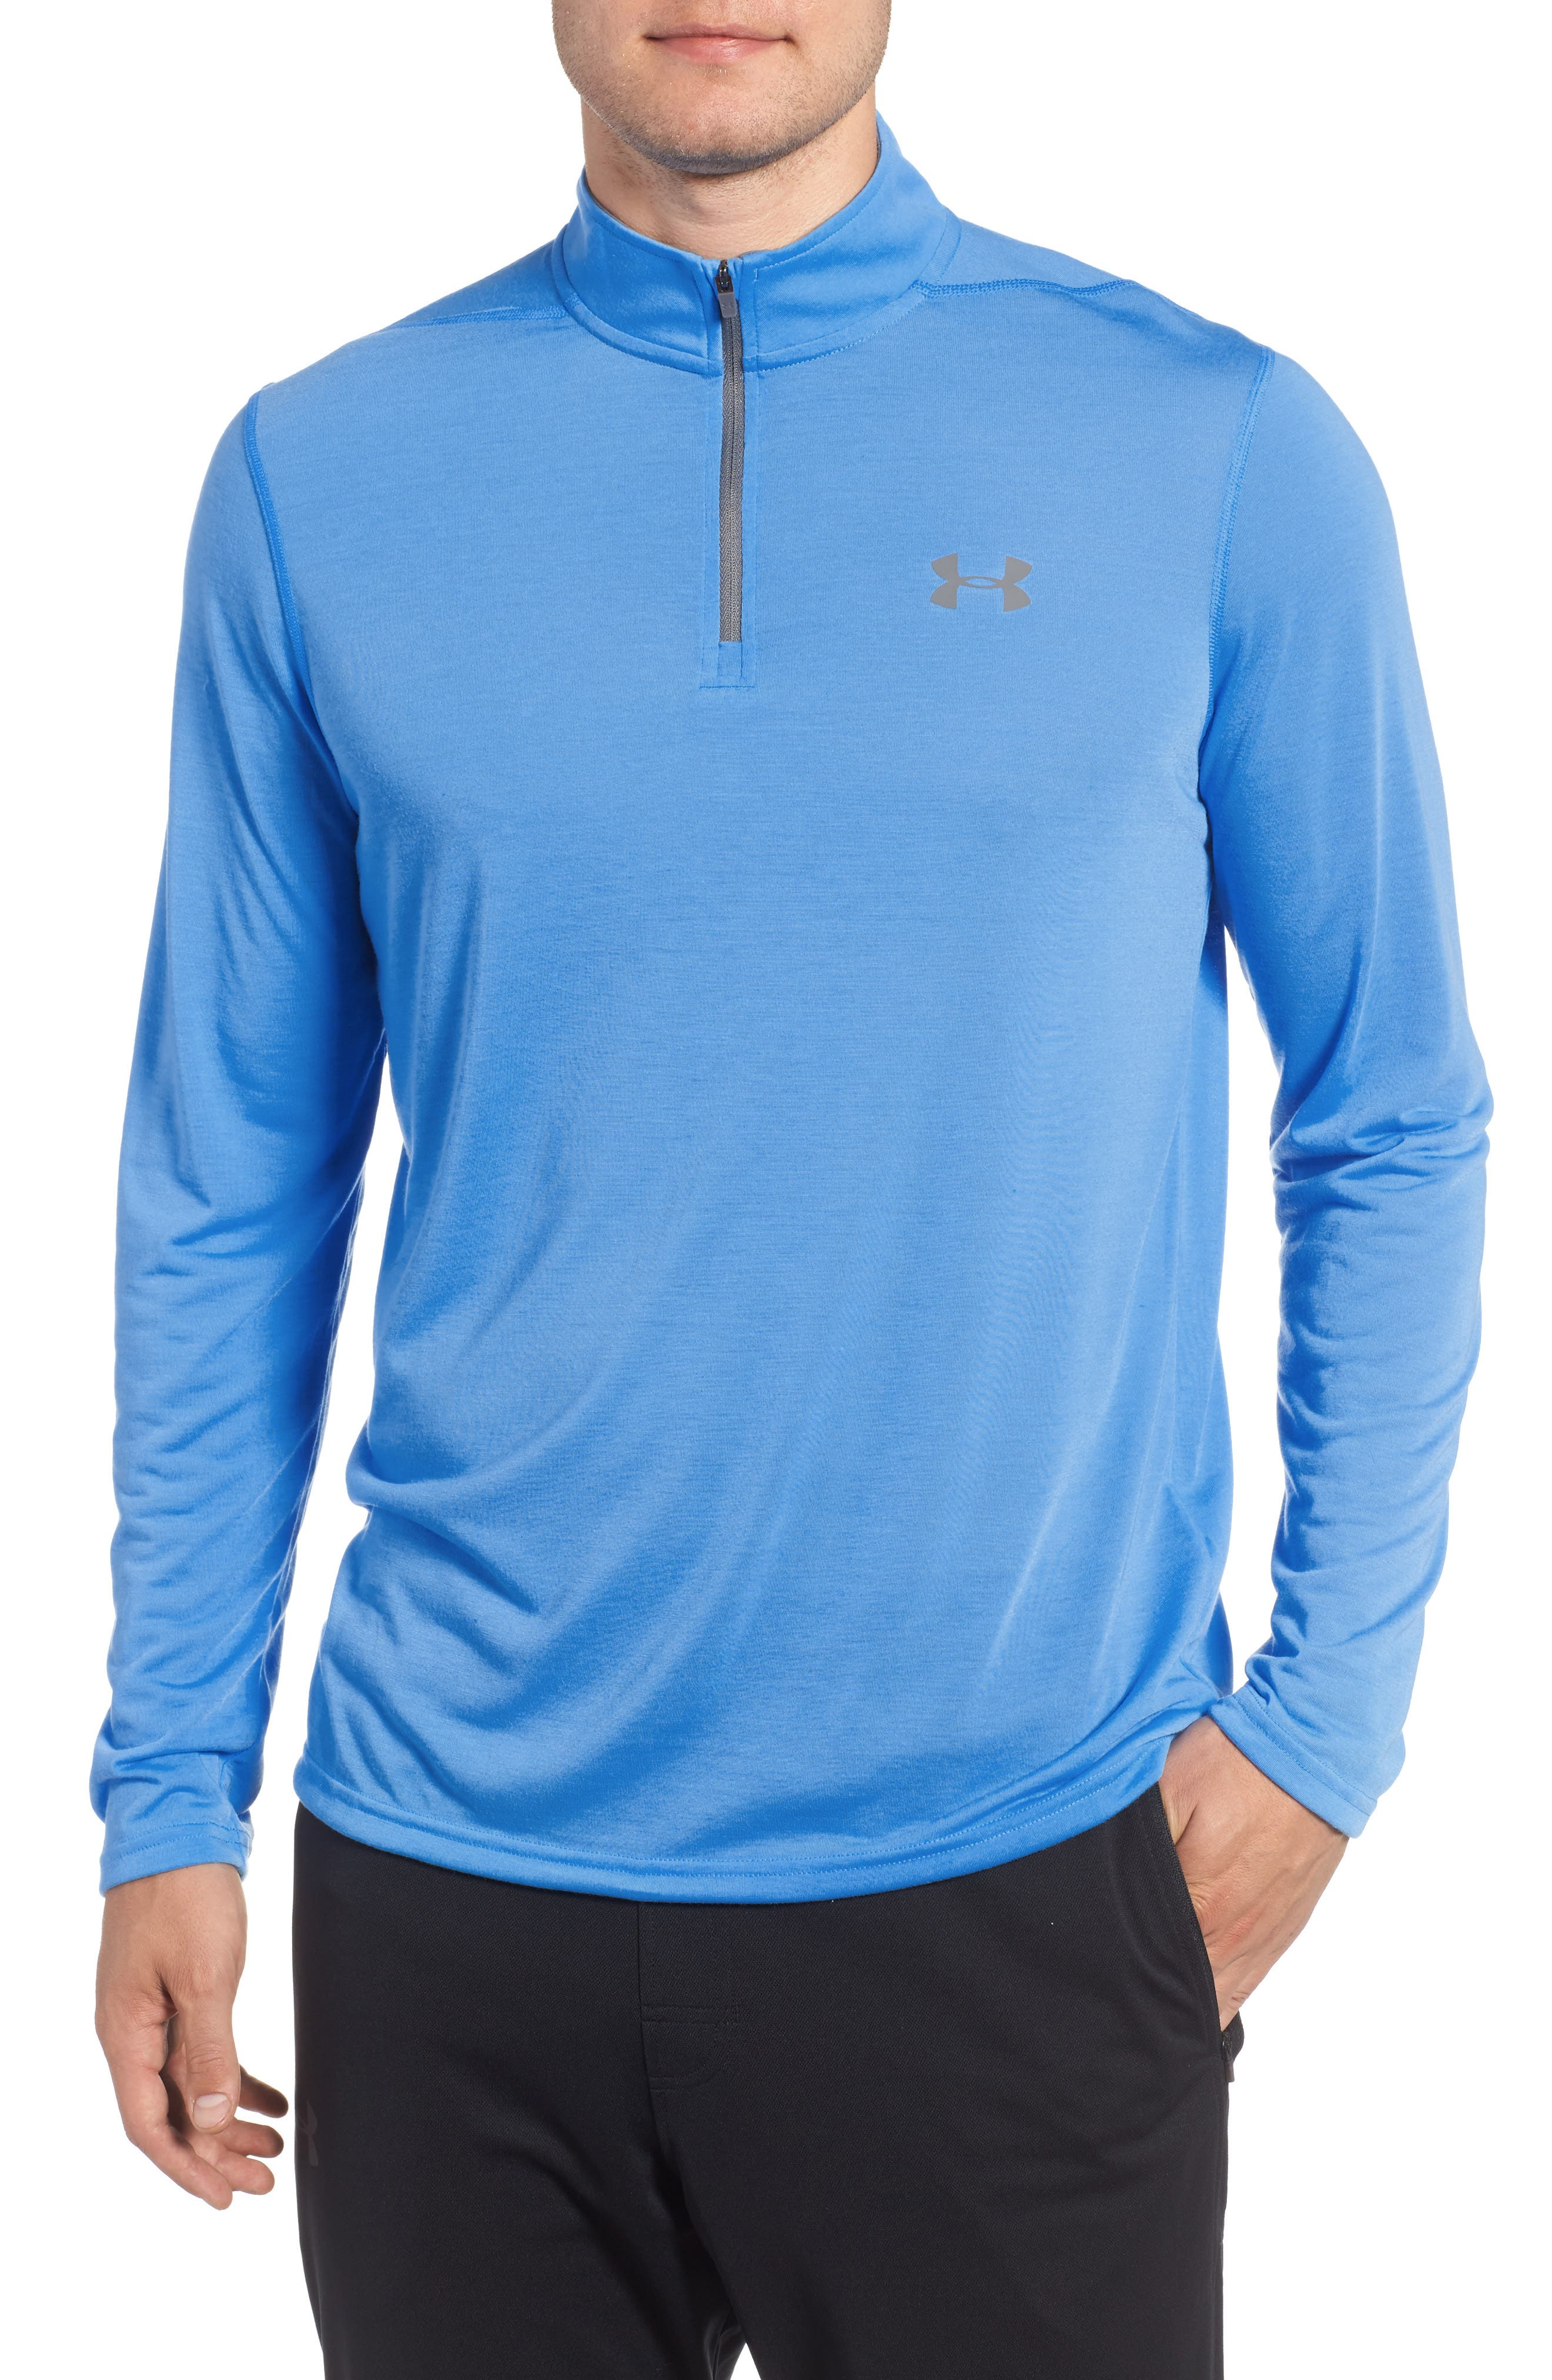 Main Image - Under Armour Threadborne Quarter-Zip Performance Shirt